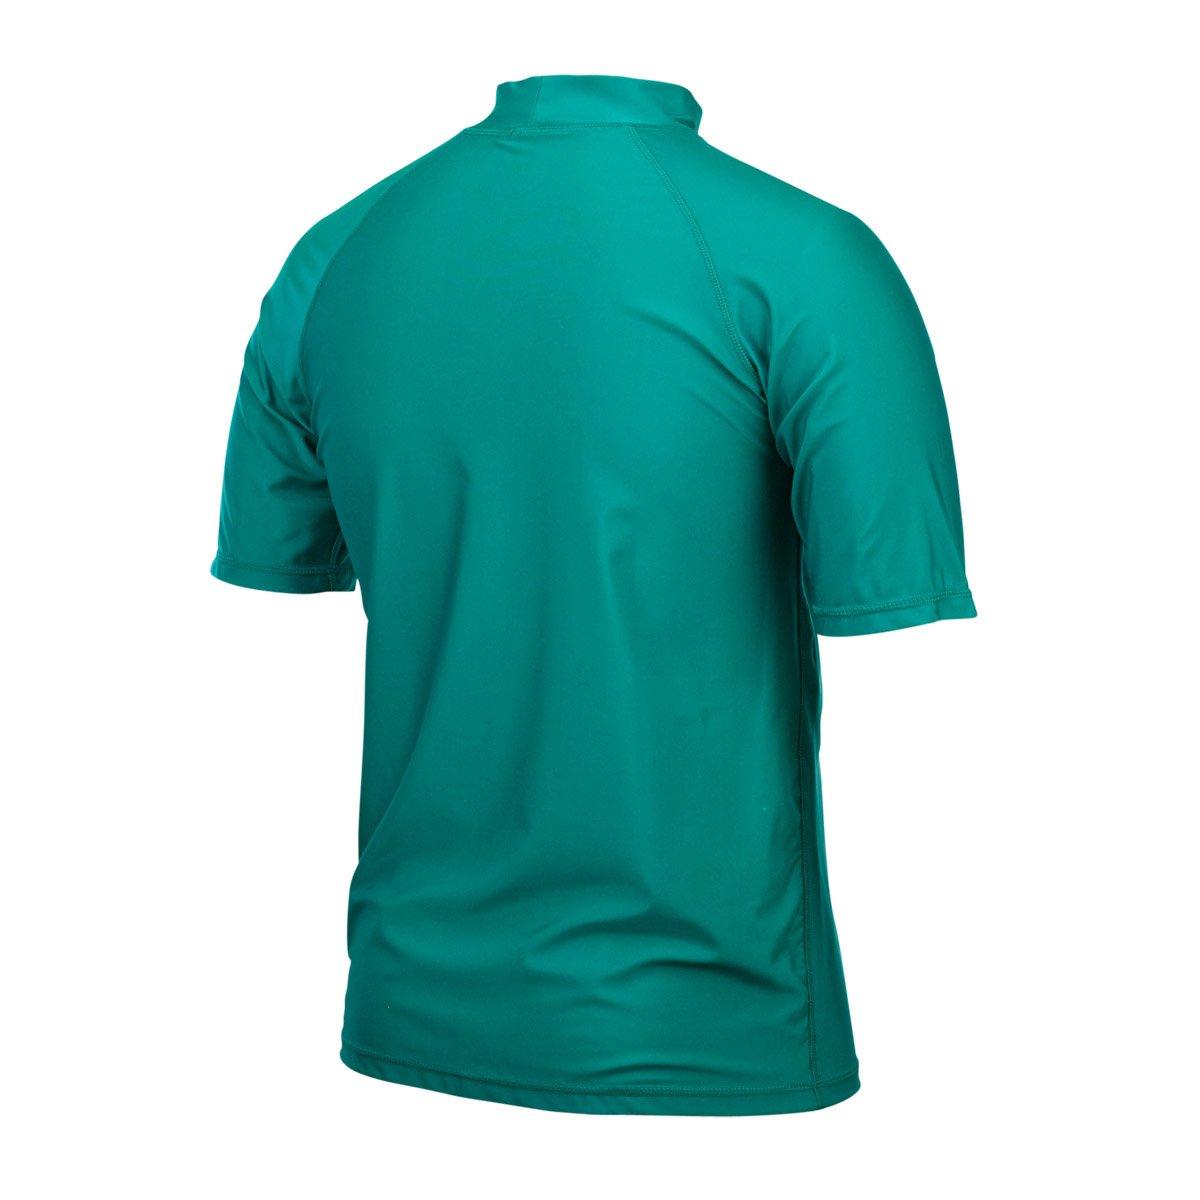 Short Sleeve Sun and Swim Shirt Sun-Blocking Swim Shirt UV Skinz Men/'s UPF 50